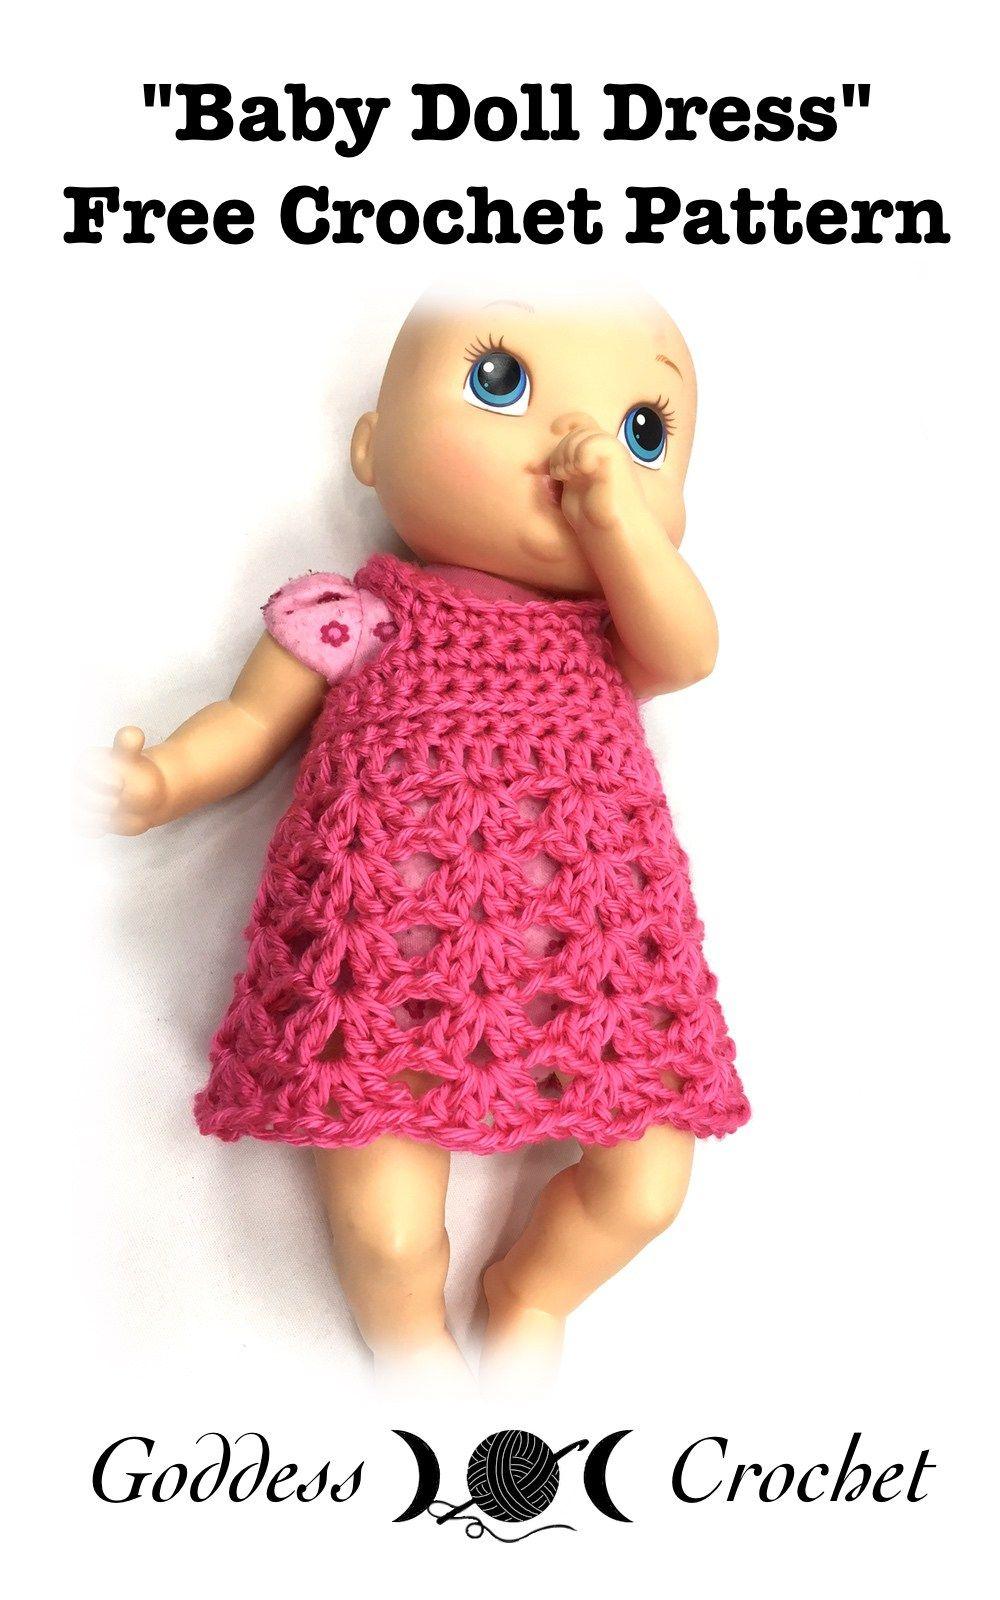 Crochet Pattern Baby Doll Clothes : Baby Doll Dress - Free Crochet Pattern Fiber Arts ...